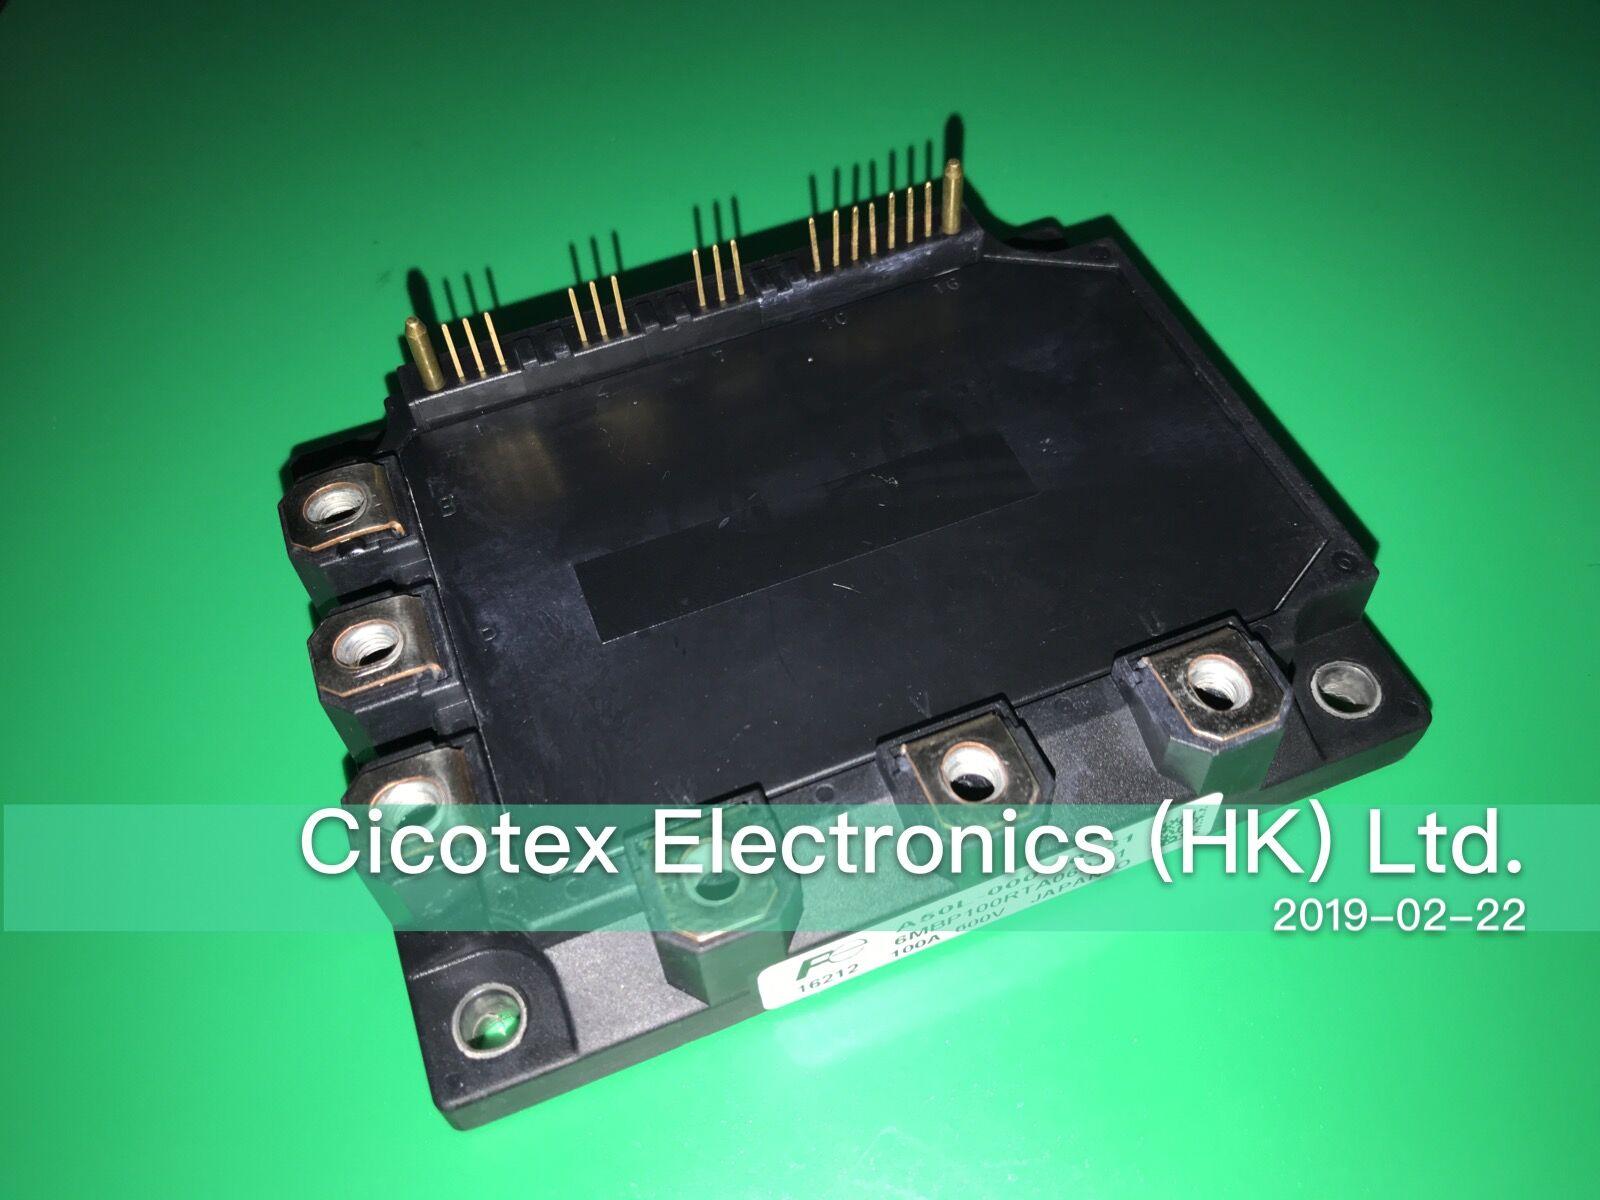 6MBP100RTA060-01 A50L-0001-0331 MODULE IGBT IPM-R3 100A 600V 6MBP100RTA-060-016MBP100RTA060-01 A50L-0001-0331 MODULE IGBT IPM-R3 100A 600V 6MBP100RTA-060-01